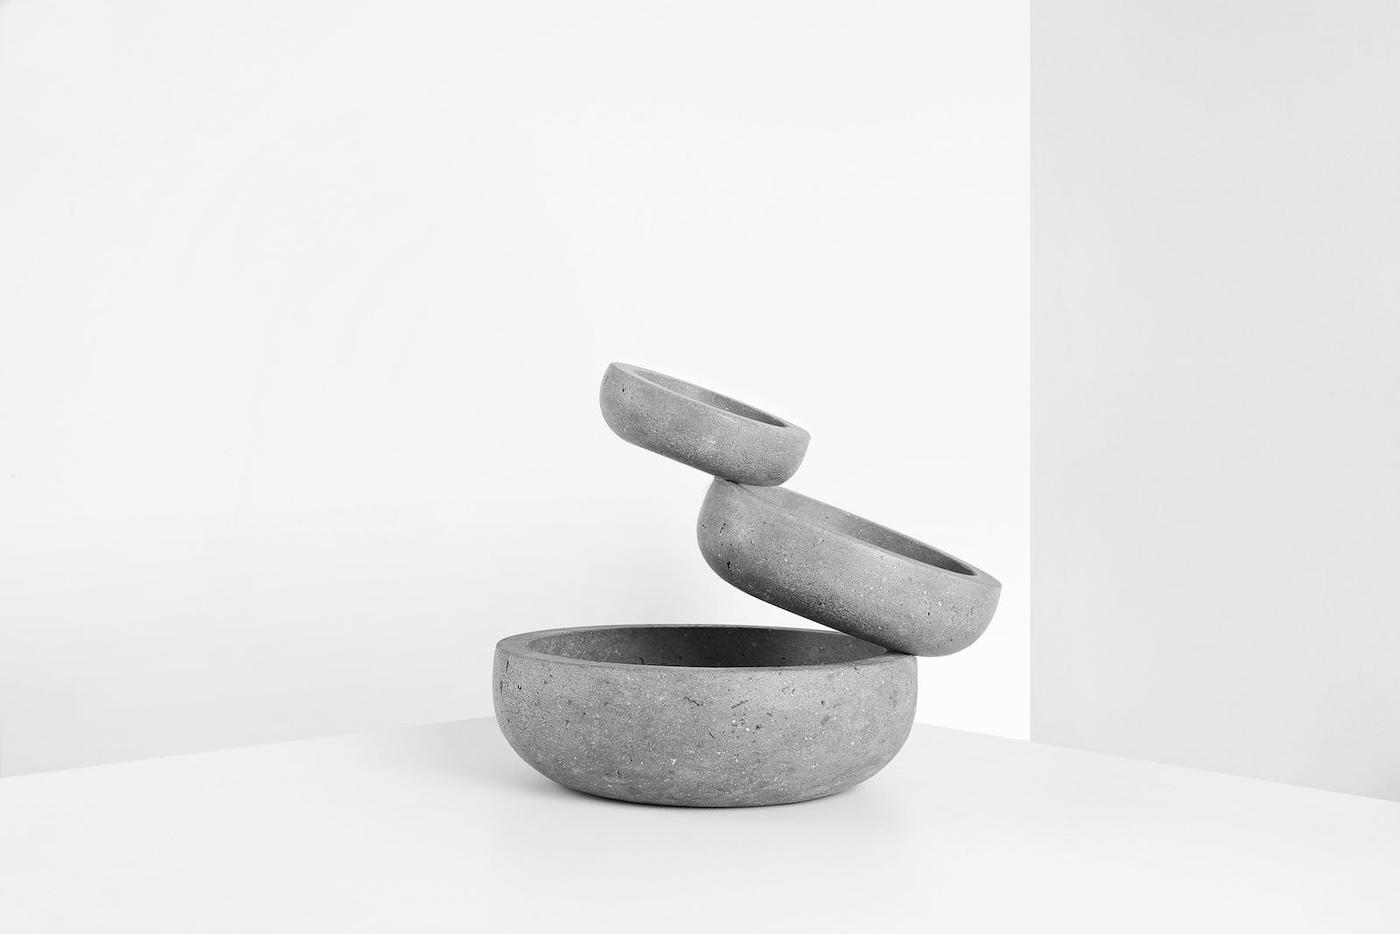 Balance-Joel-Escalona-Minimalissimo-07-1600x1067.jpg